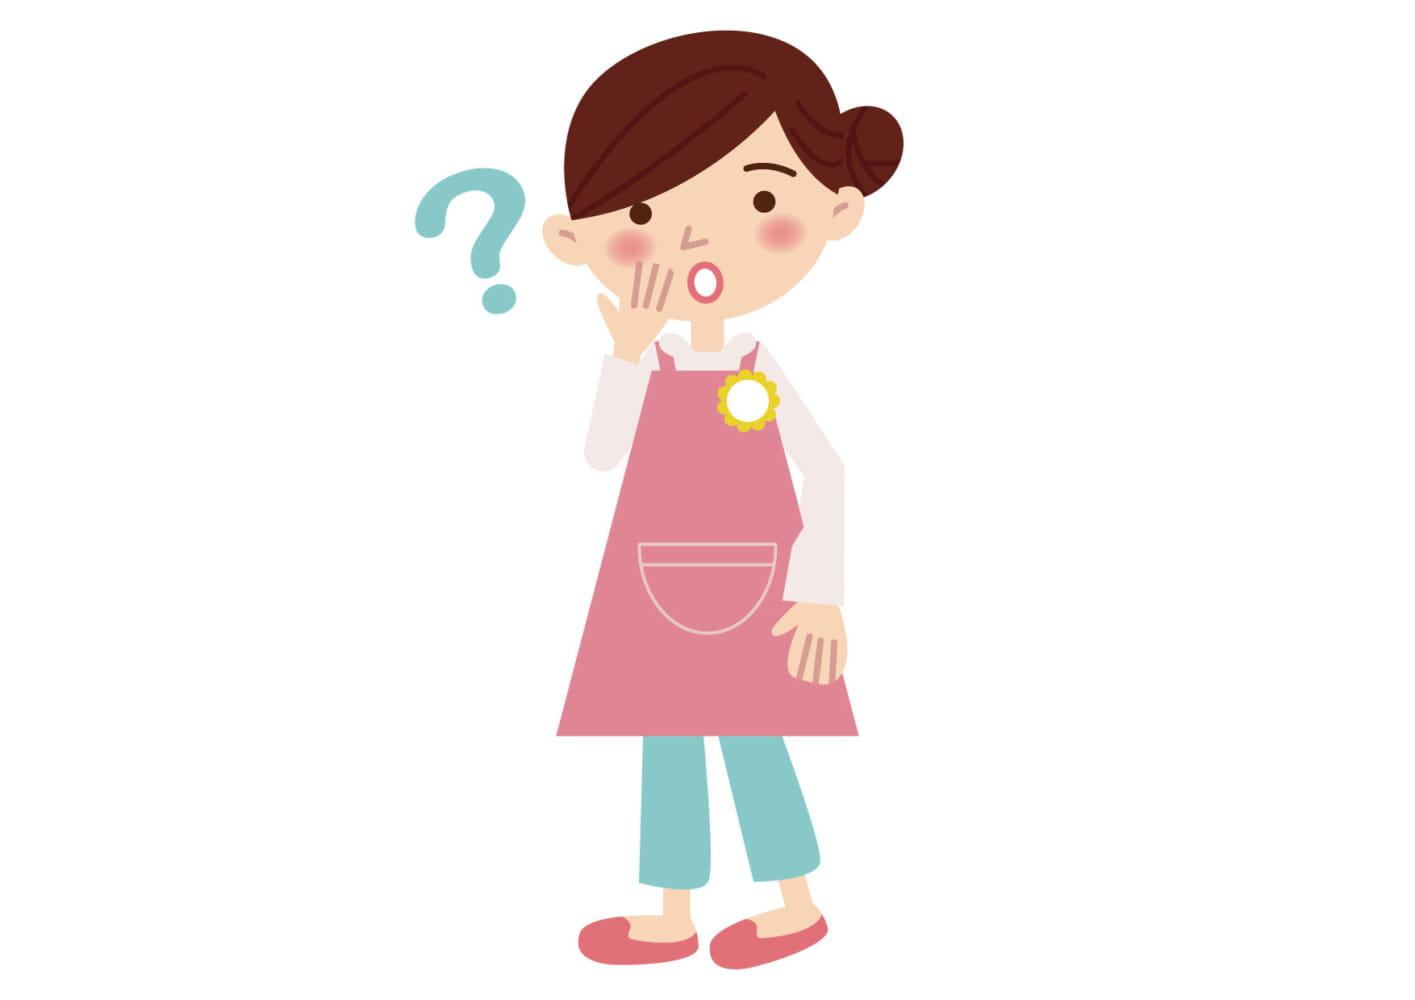 「女性 疑問」の画像検索結果